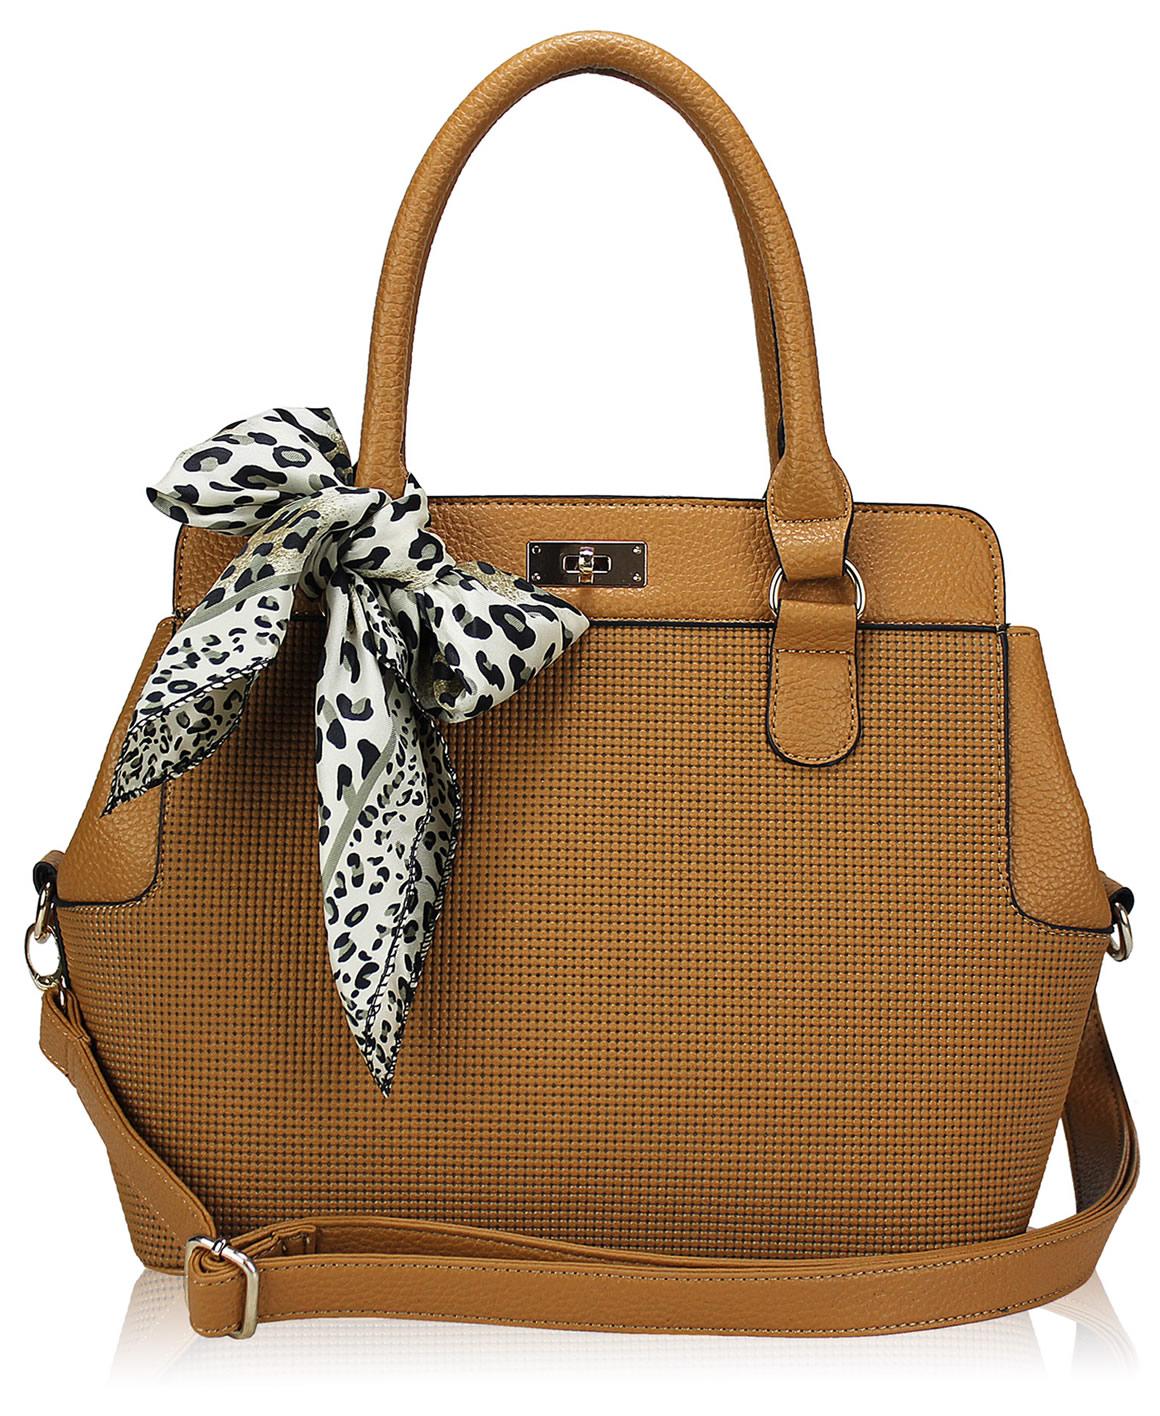 wholesale fashion scarf tote handbag